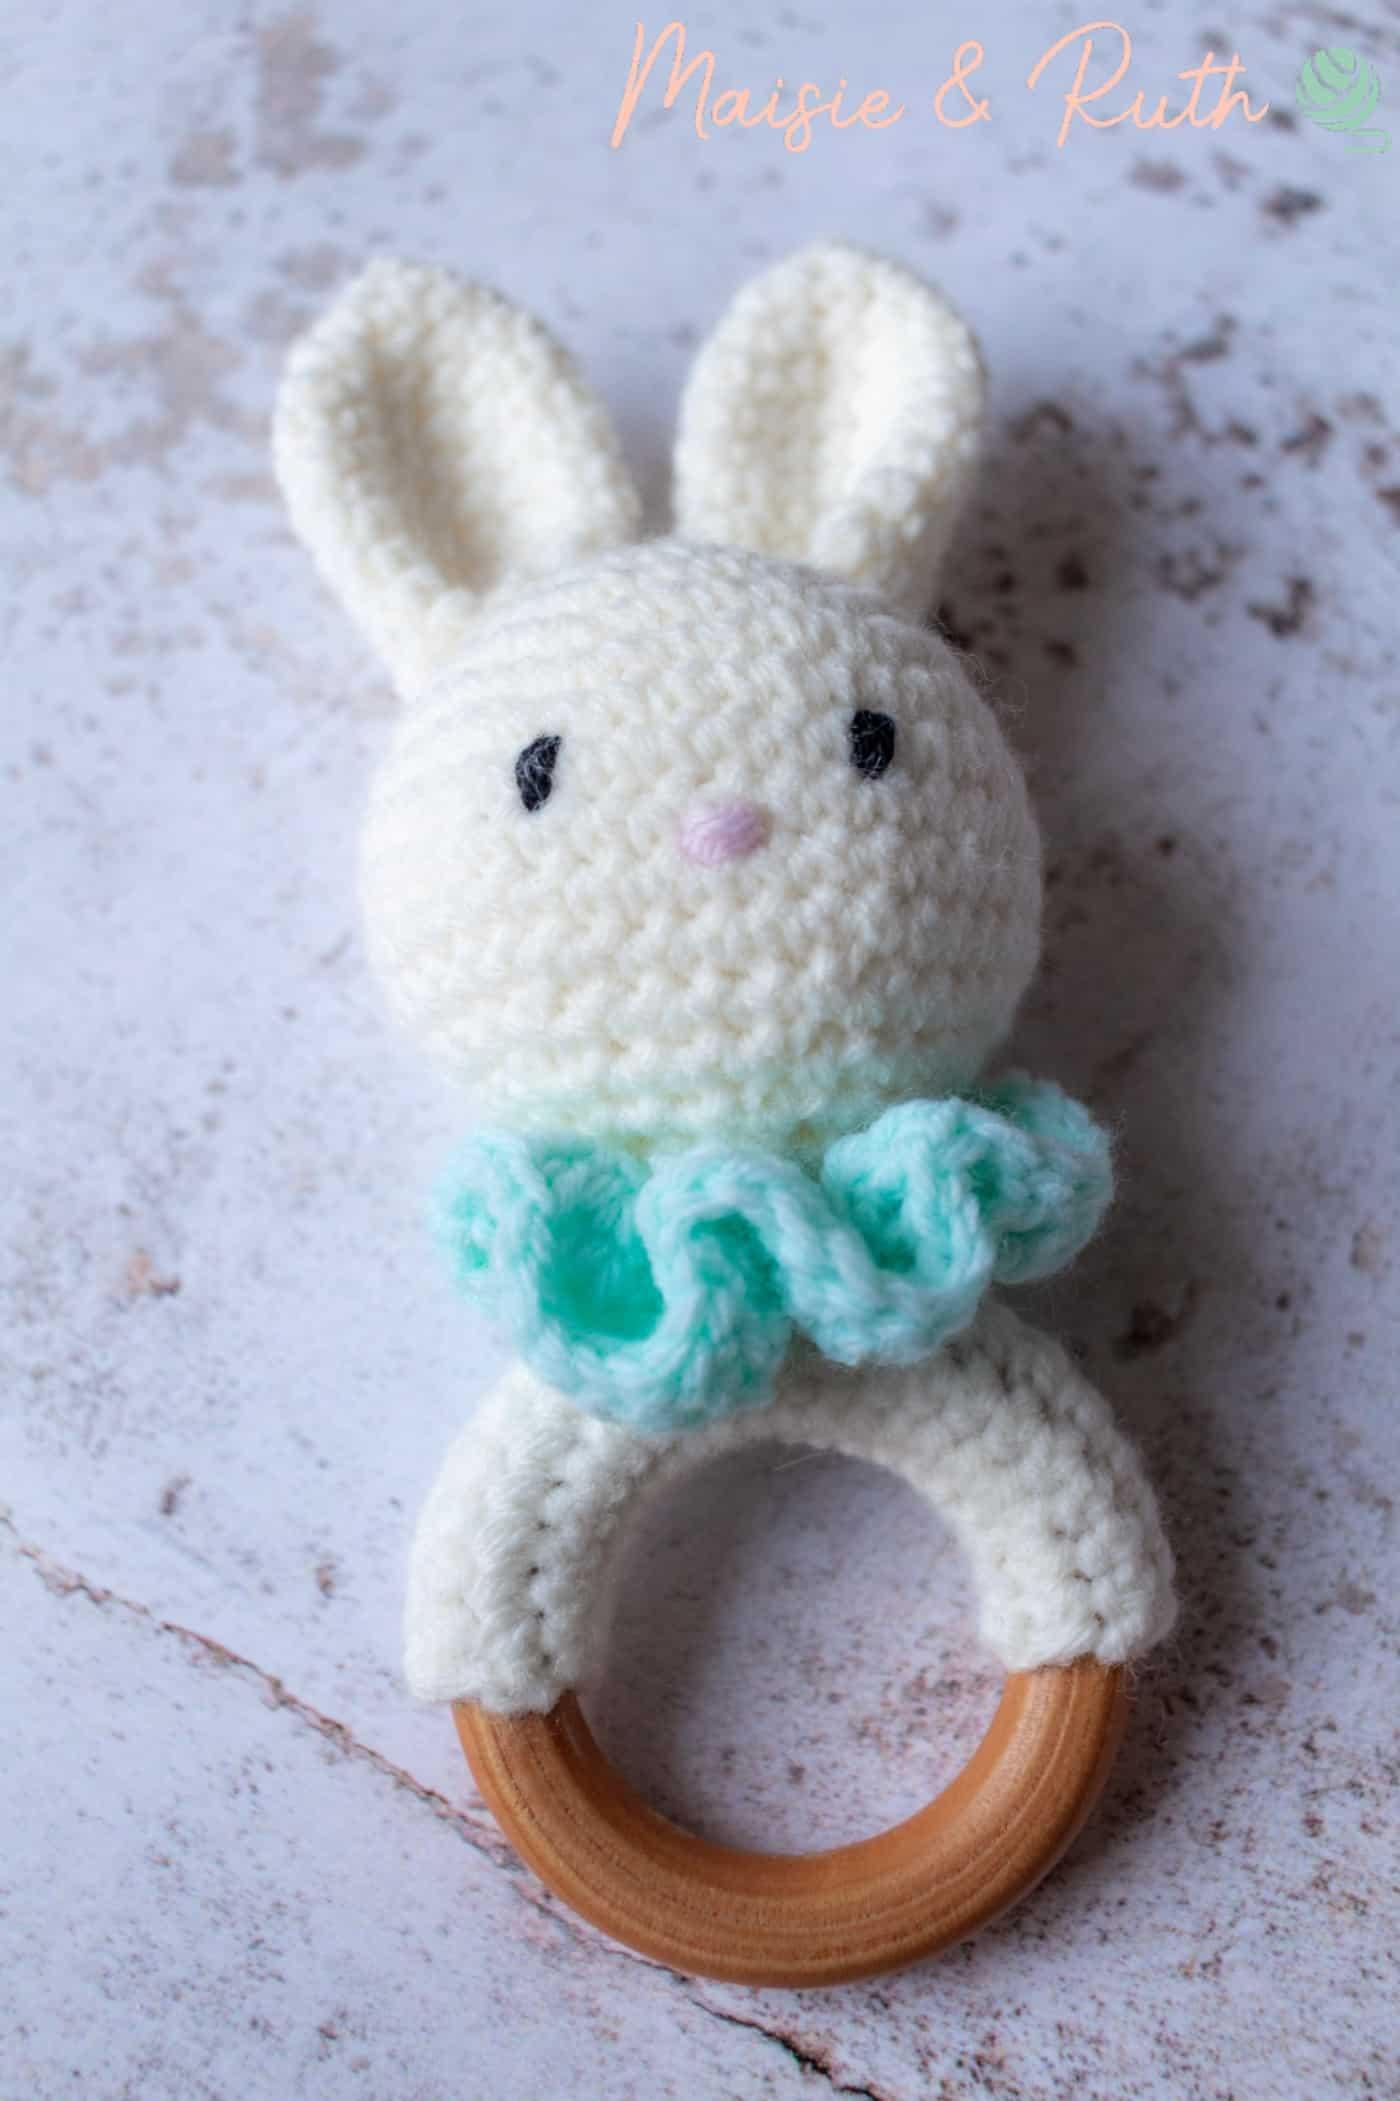 Free Crochet Amigurumi Pattern Bunny on Speckled Flaylay